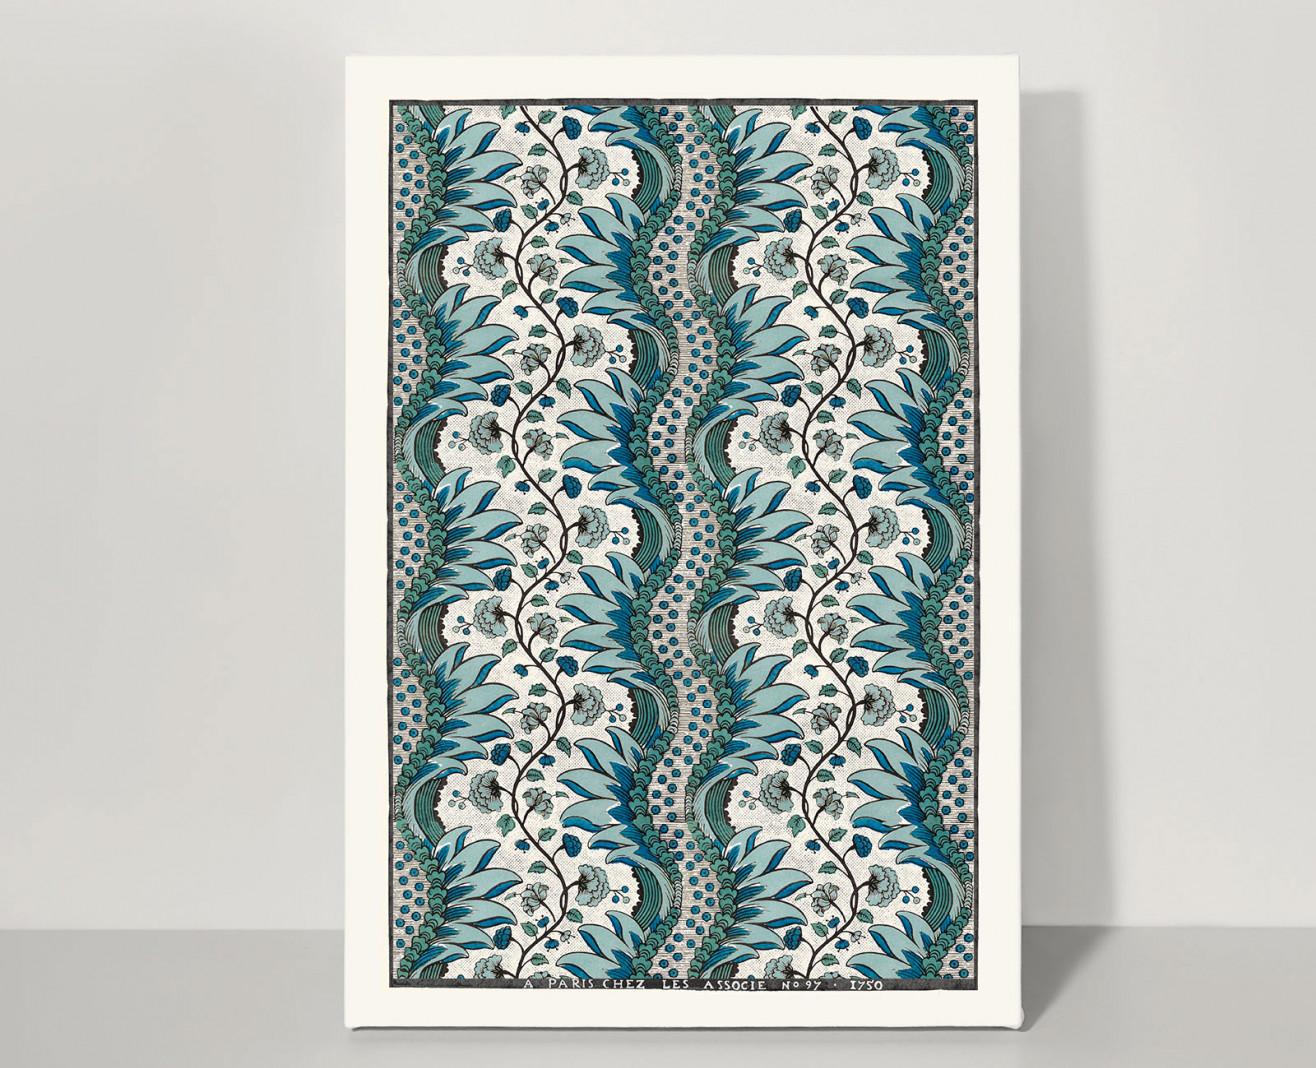 Domino sheet blue Carnations . 1750